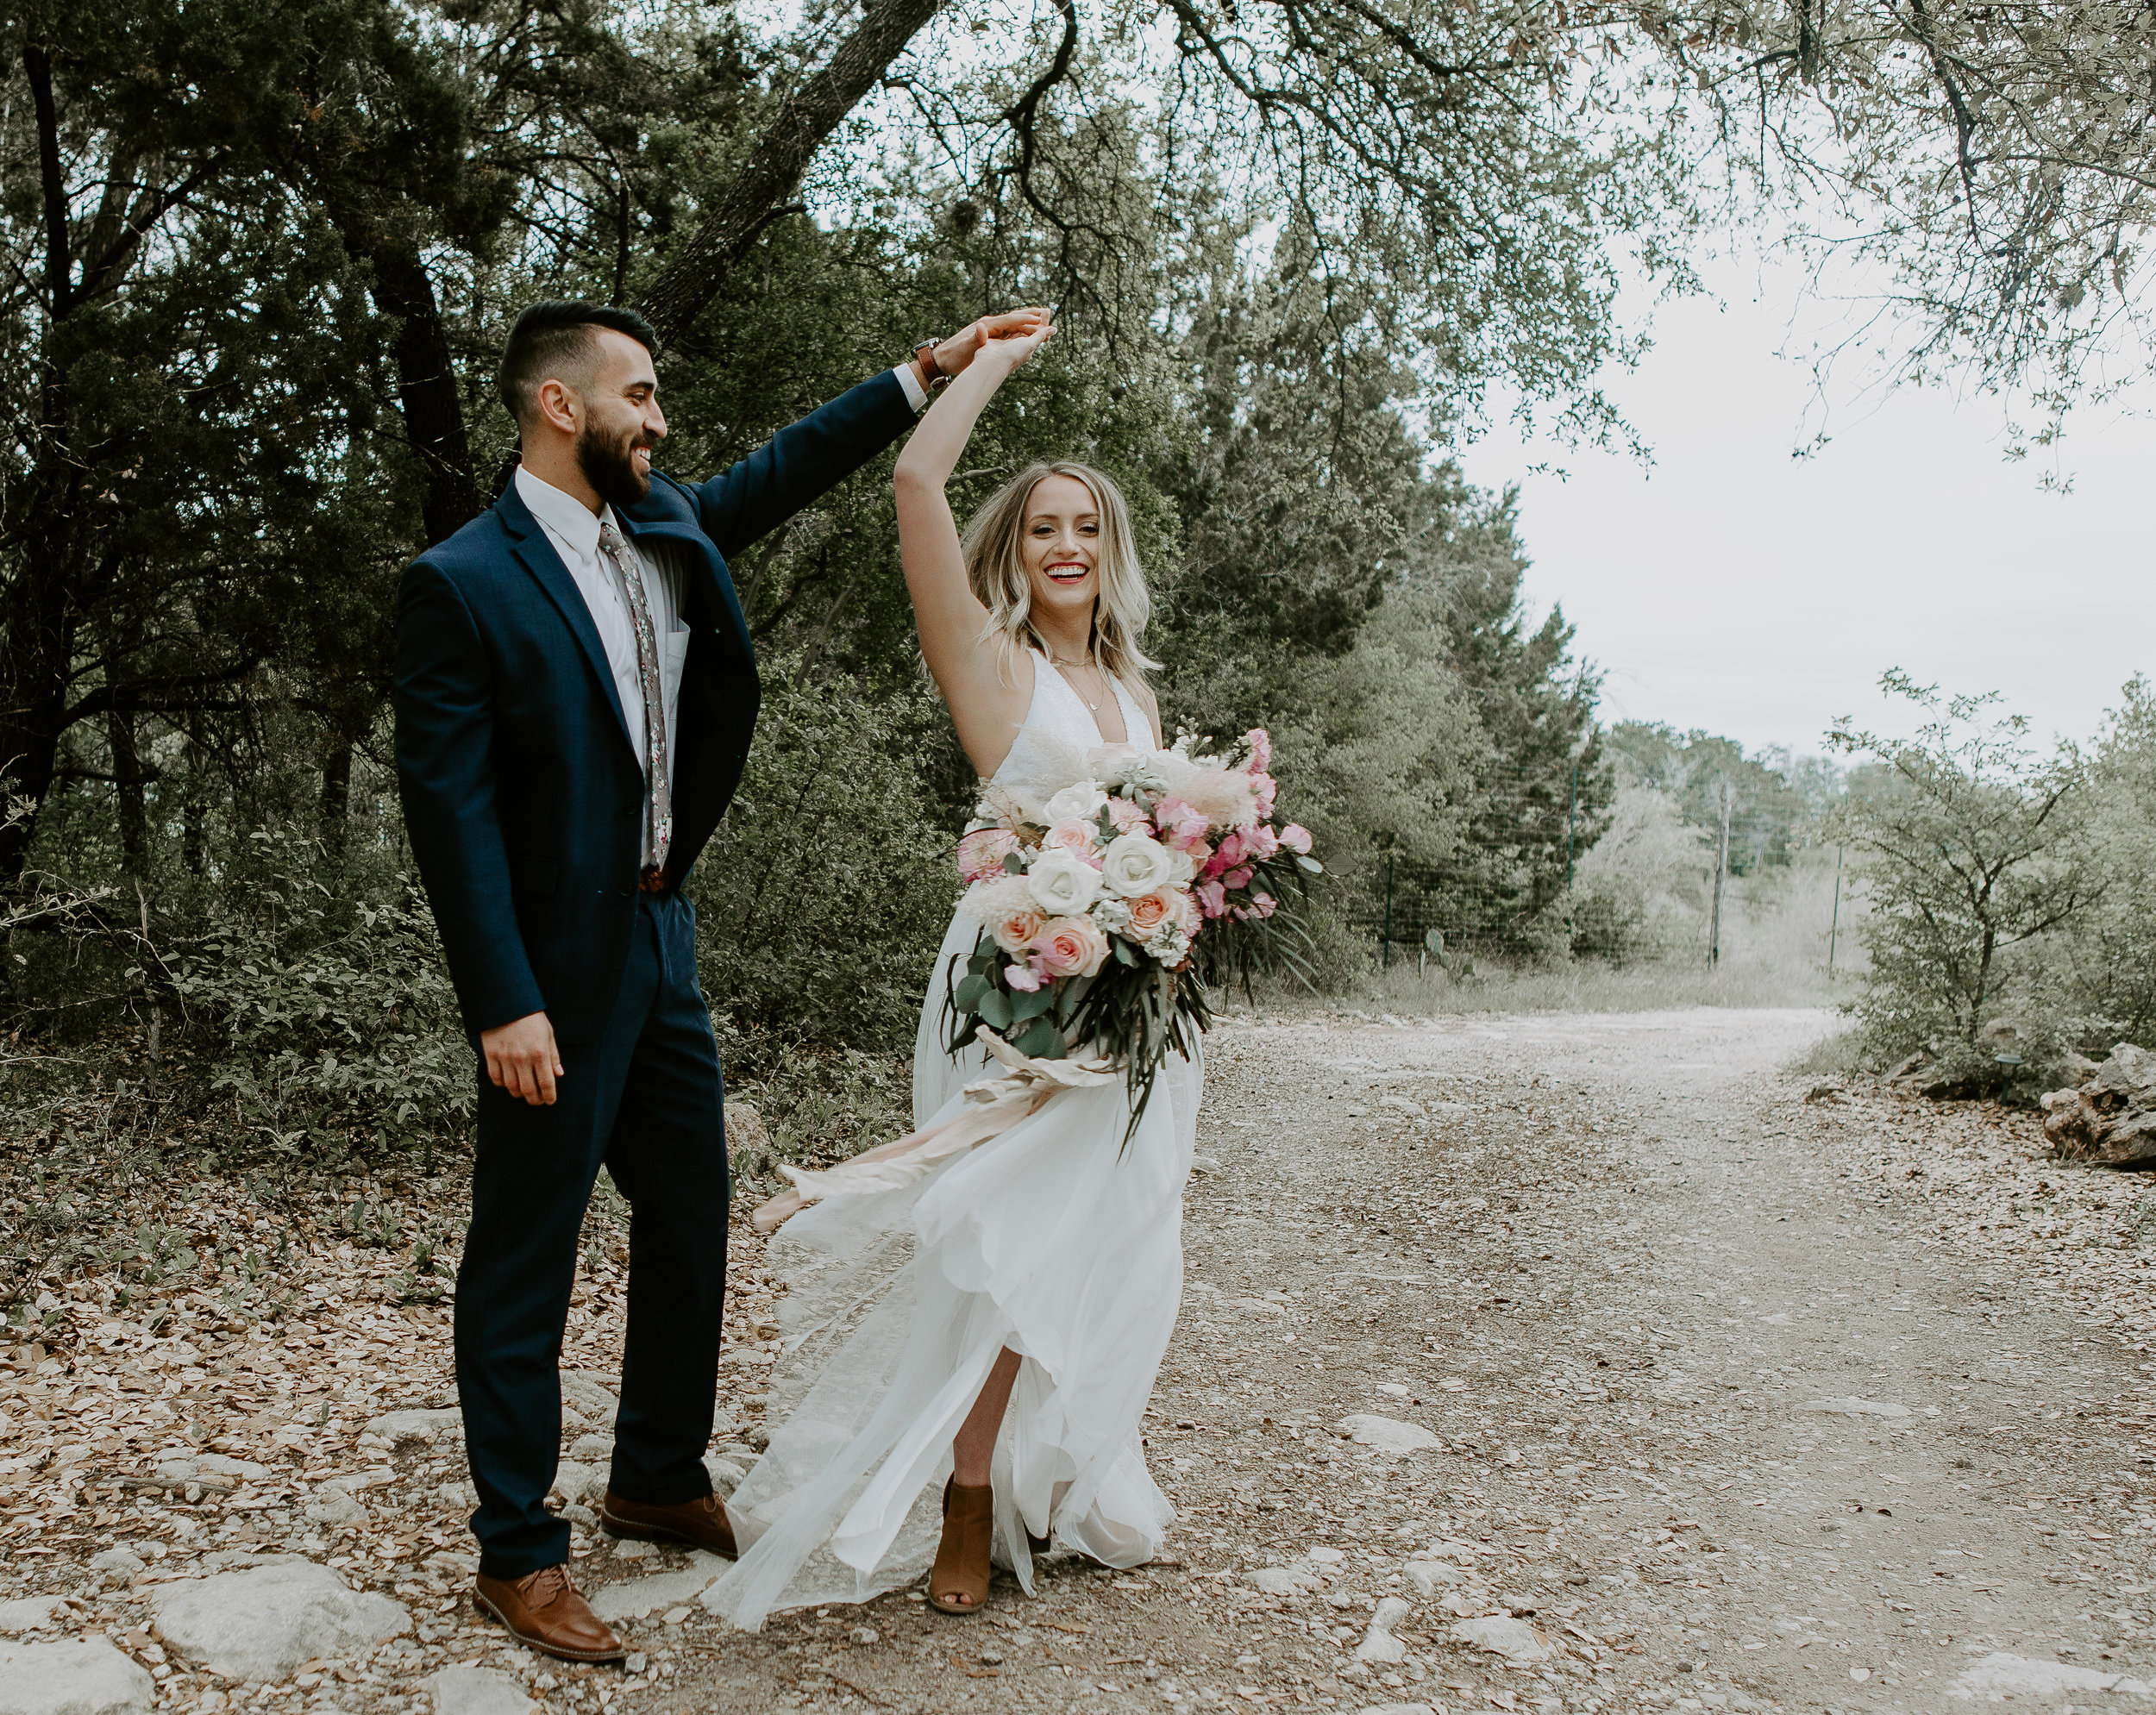 Lynsie.Rae.Photography_2018 Elopement_Austin TX-21.jpg